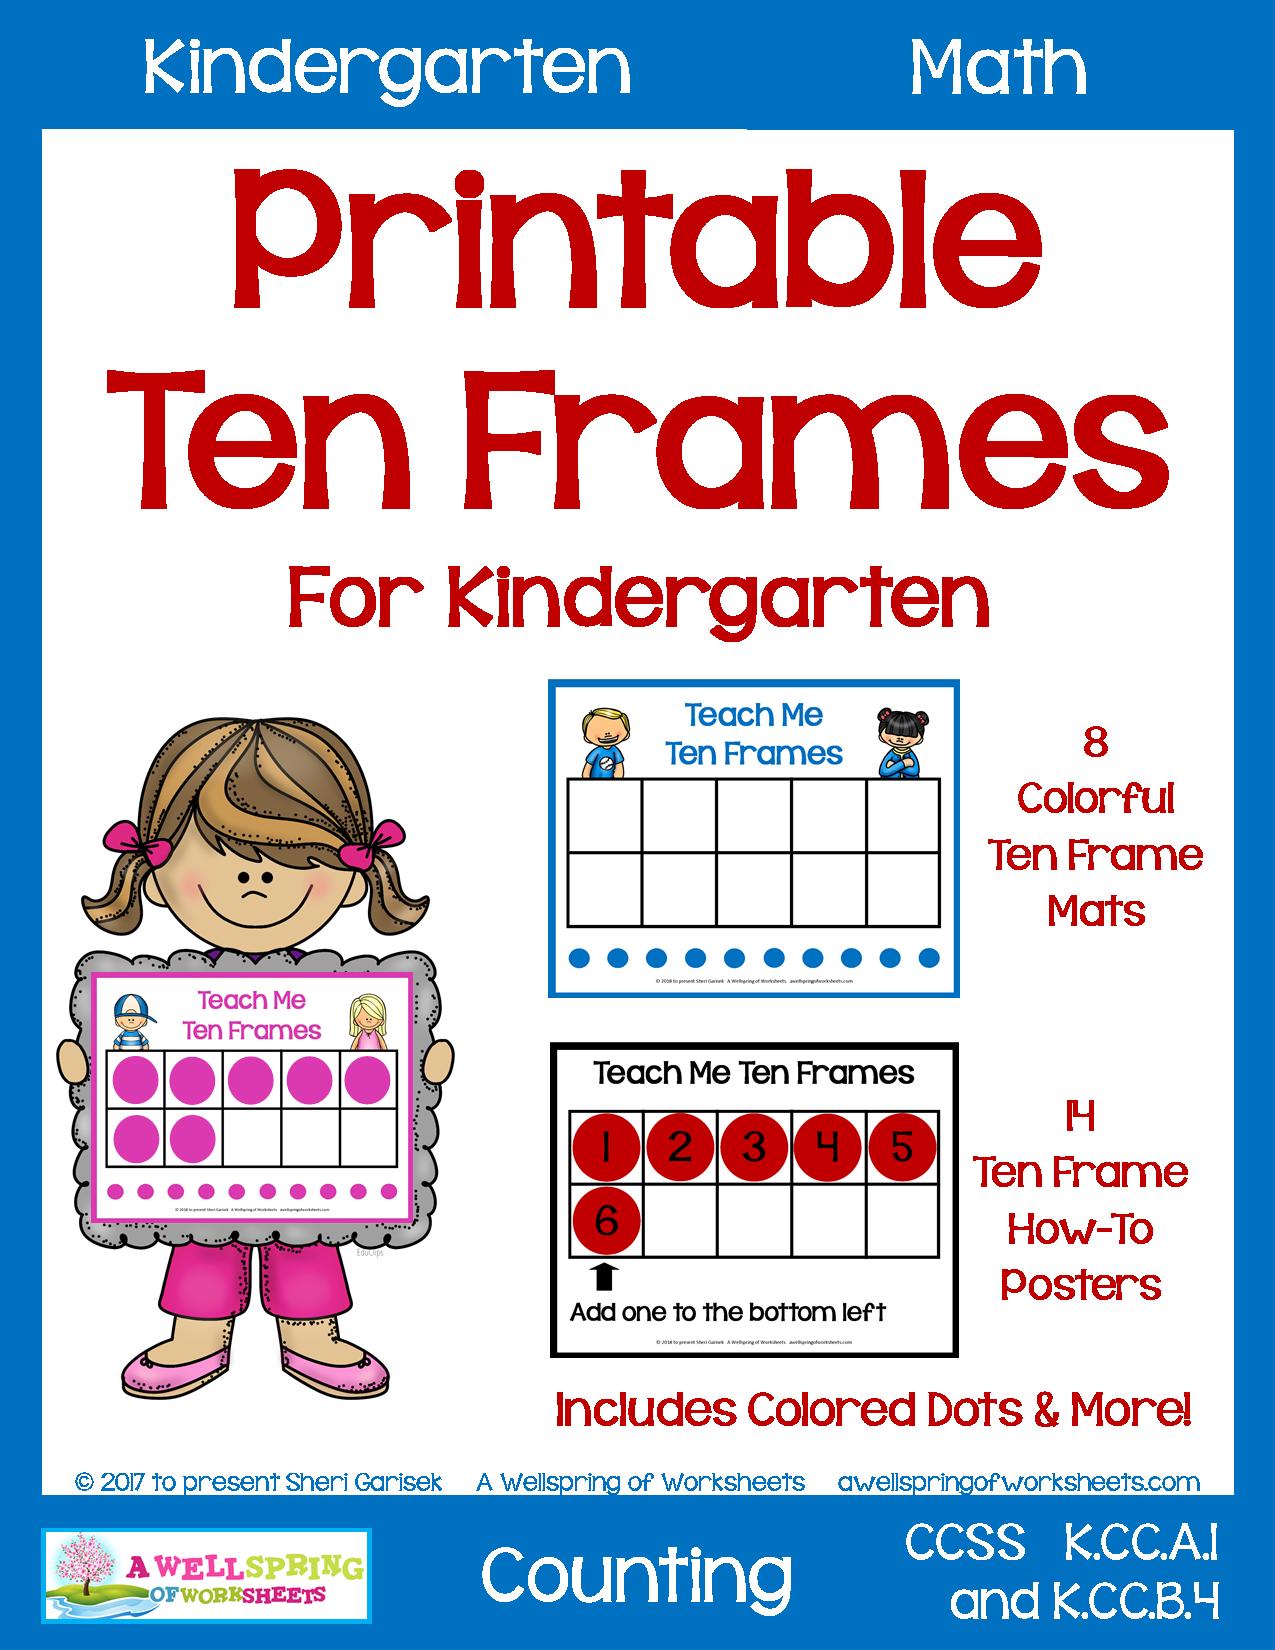 Printable Ten Frames For Kindergarten